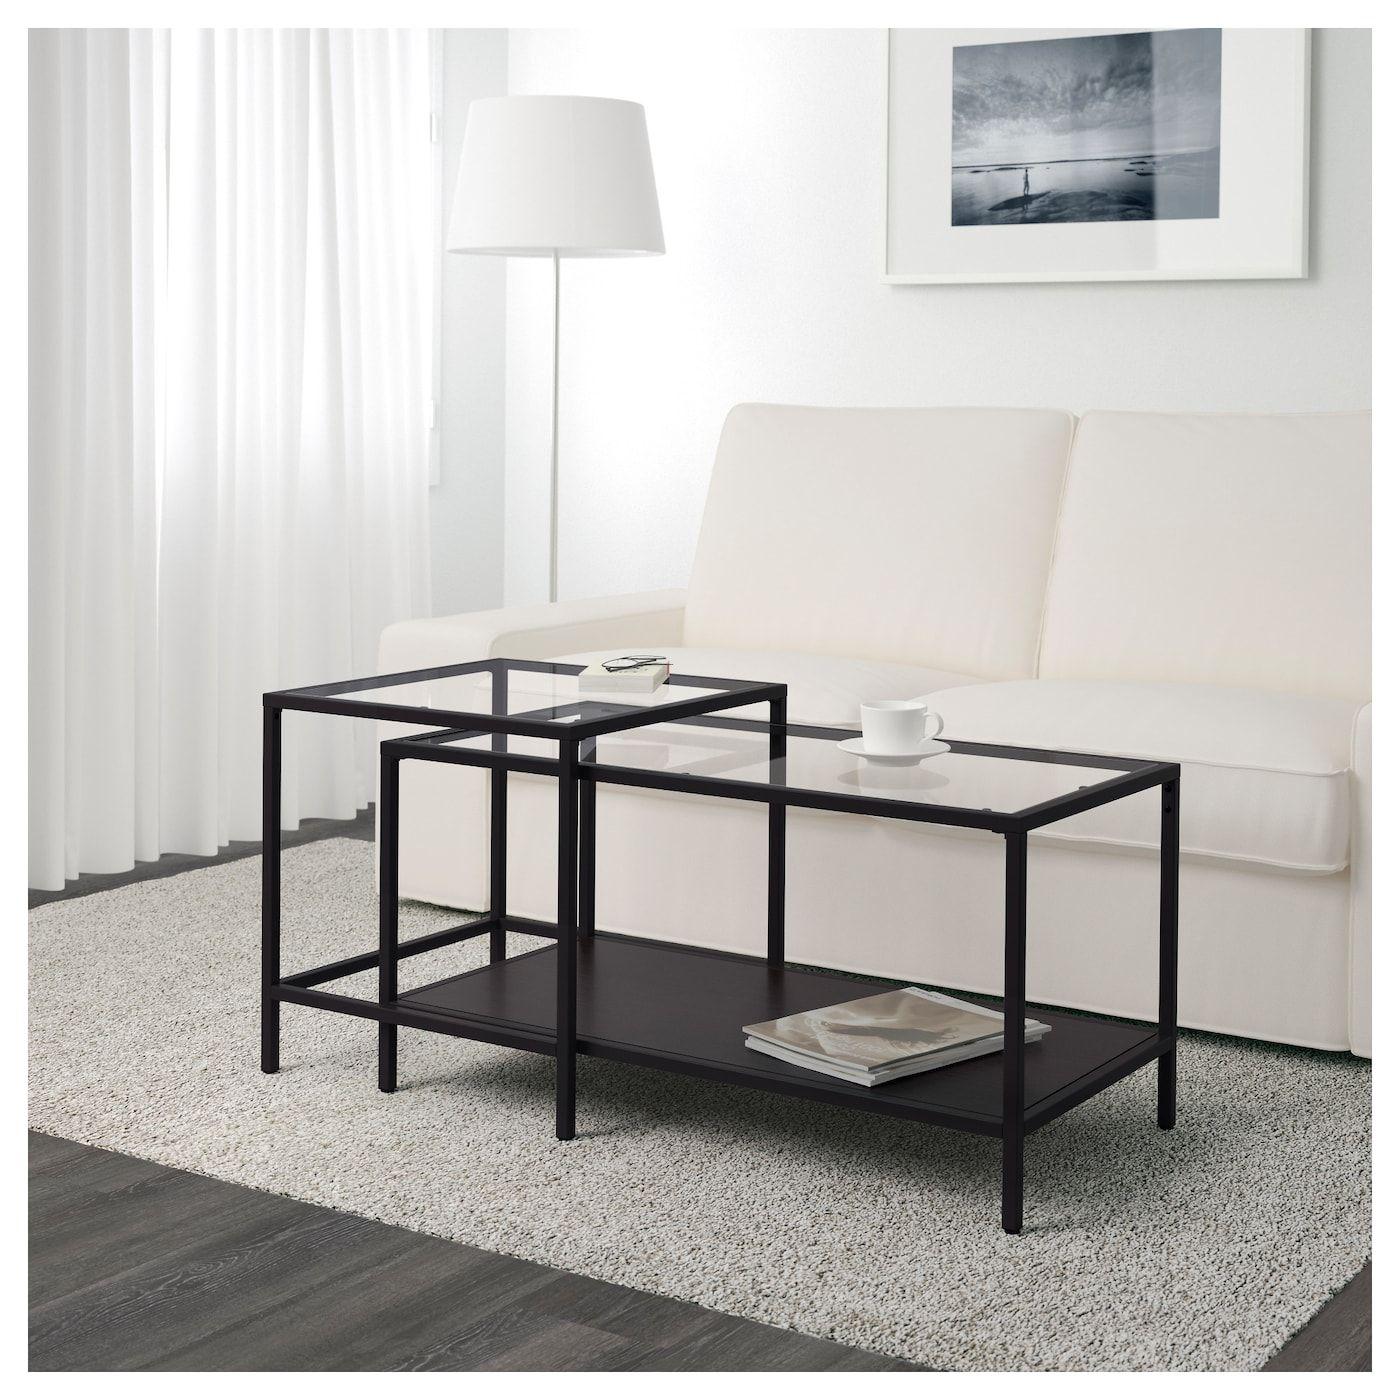 Ikea Tavoli Di Vetro.Vittsjo Set Di 2 Tavolini Marrone Nero Vetro 90x50 Cm